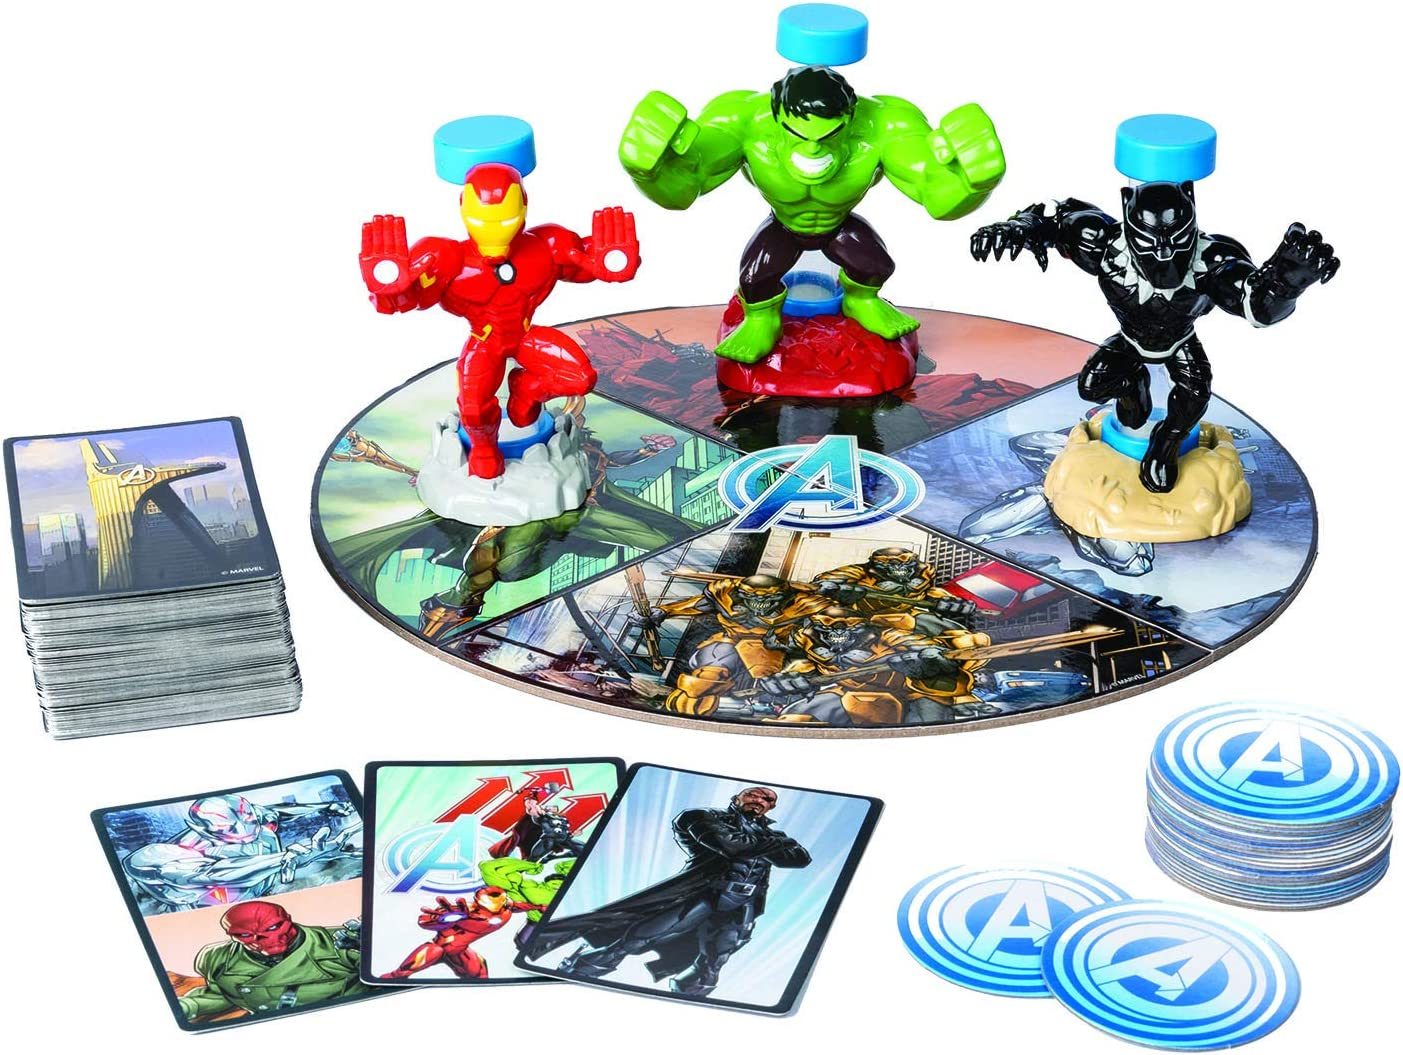 Amazon.com: Cardinal Games Marvels Avengers Hero Rush Board ...